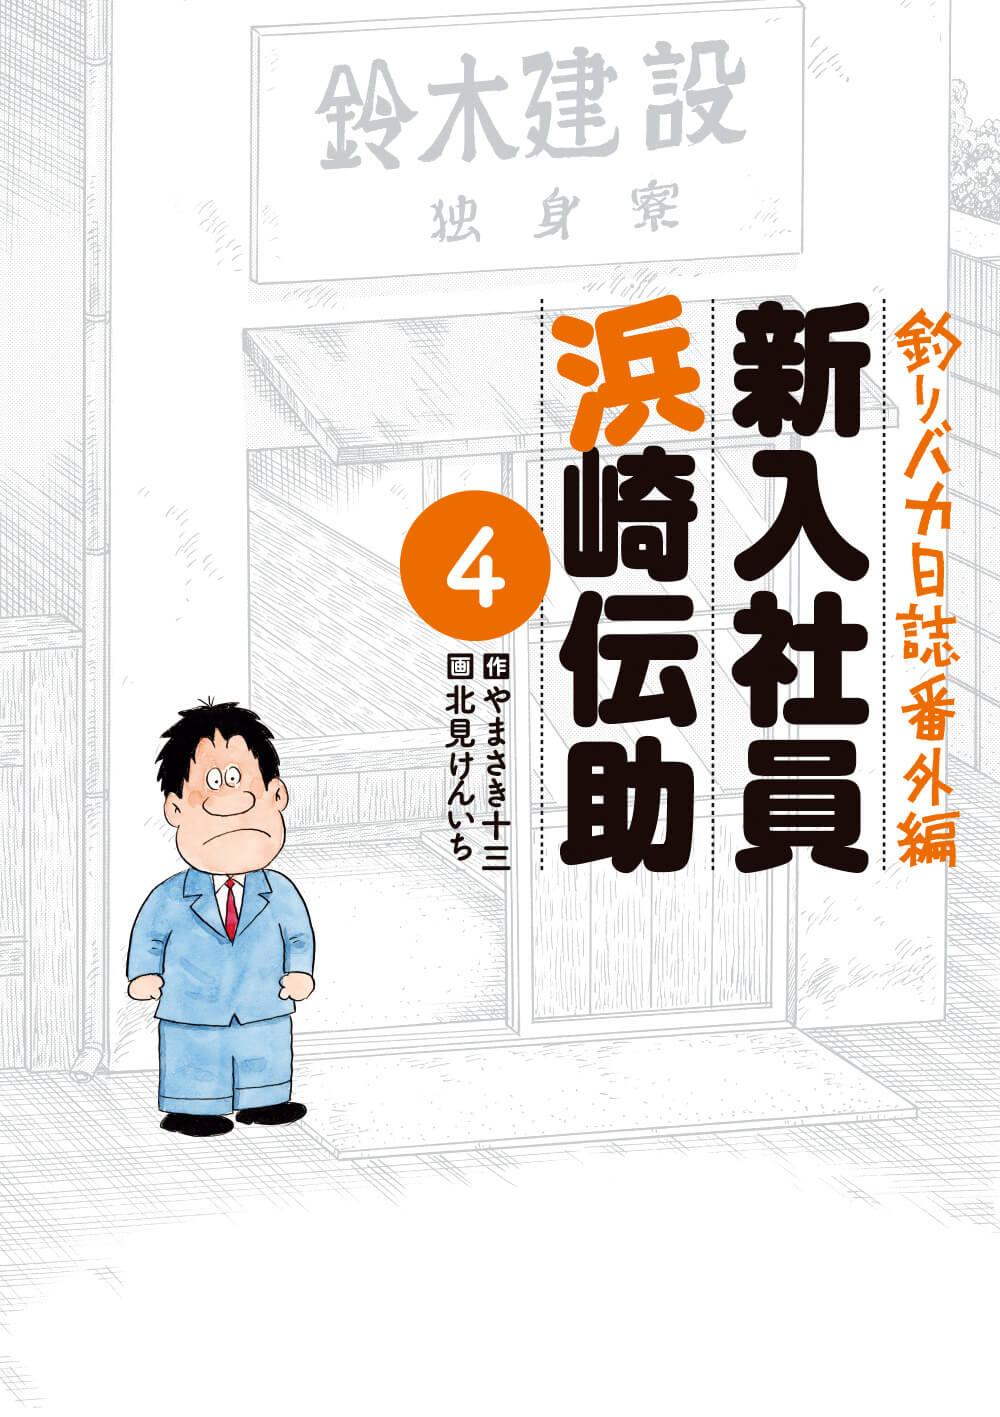 釣りバカ日誌番外編 新入社員 浜崎伝助 第4集